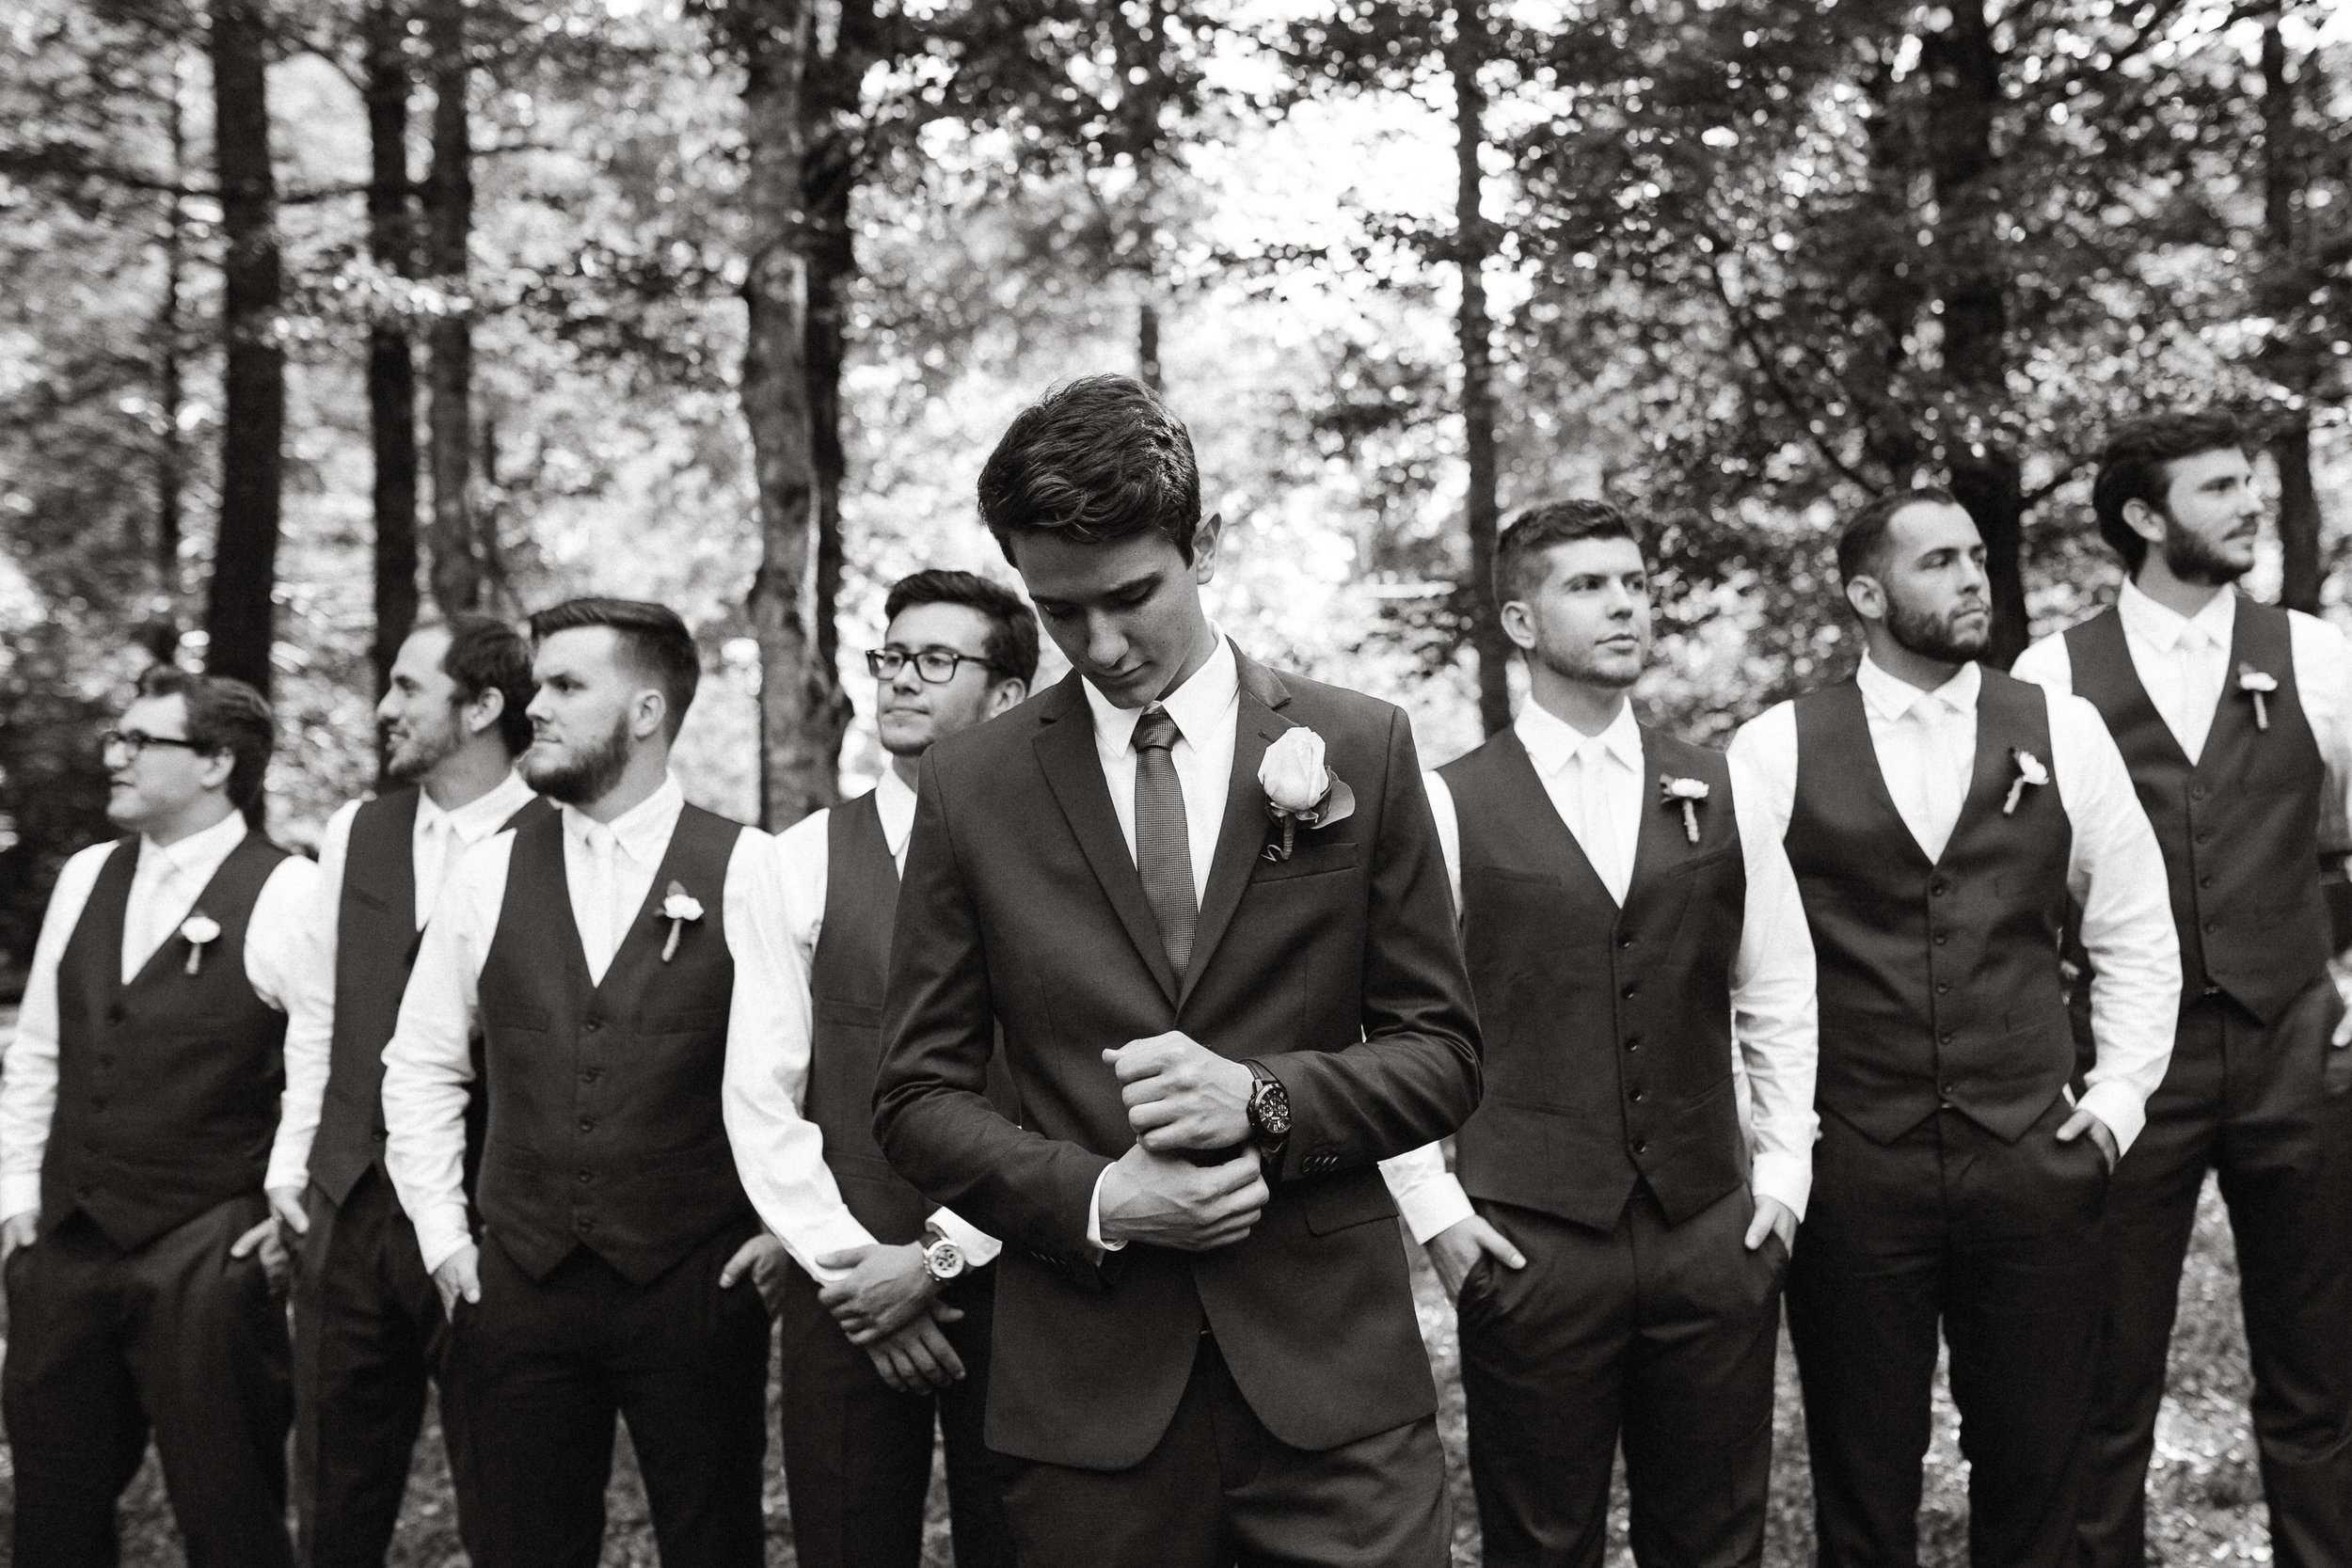 memphis tn wedding-98.jpg